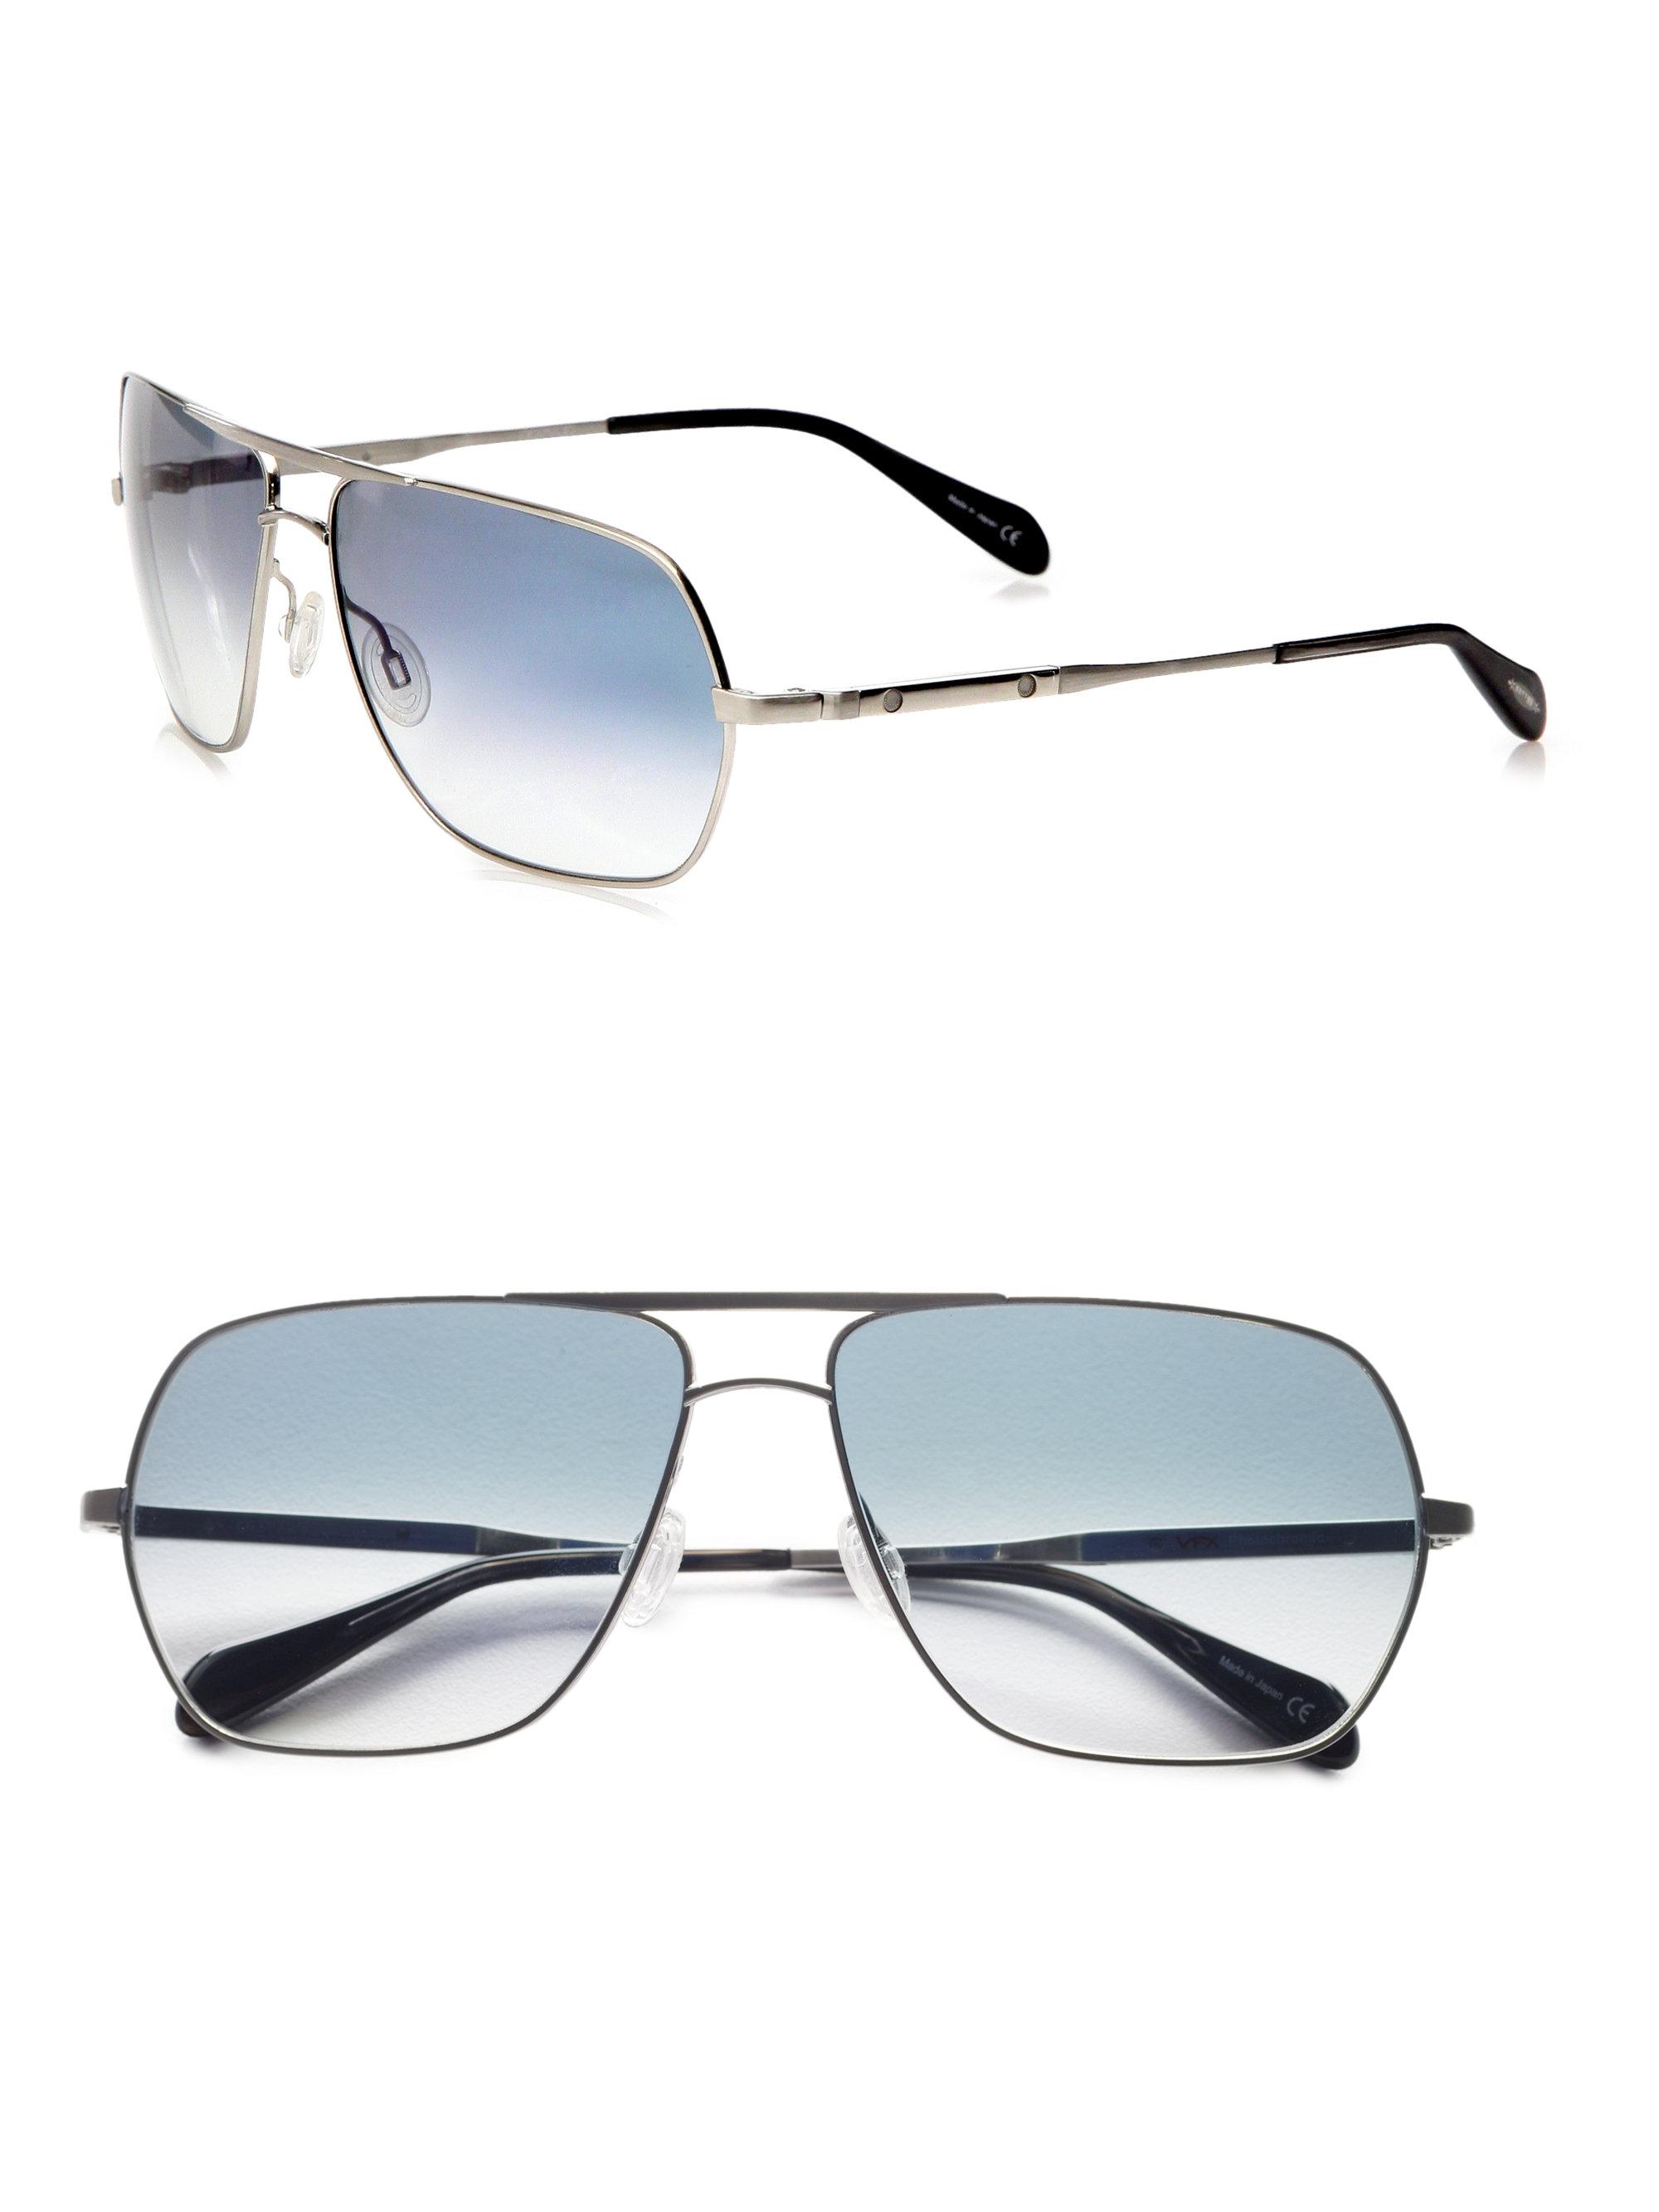 oliver peoples victory polarized aviator sunglasses. Black Bedroom Furniture Sets. Home Design Ideas